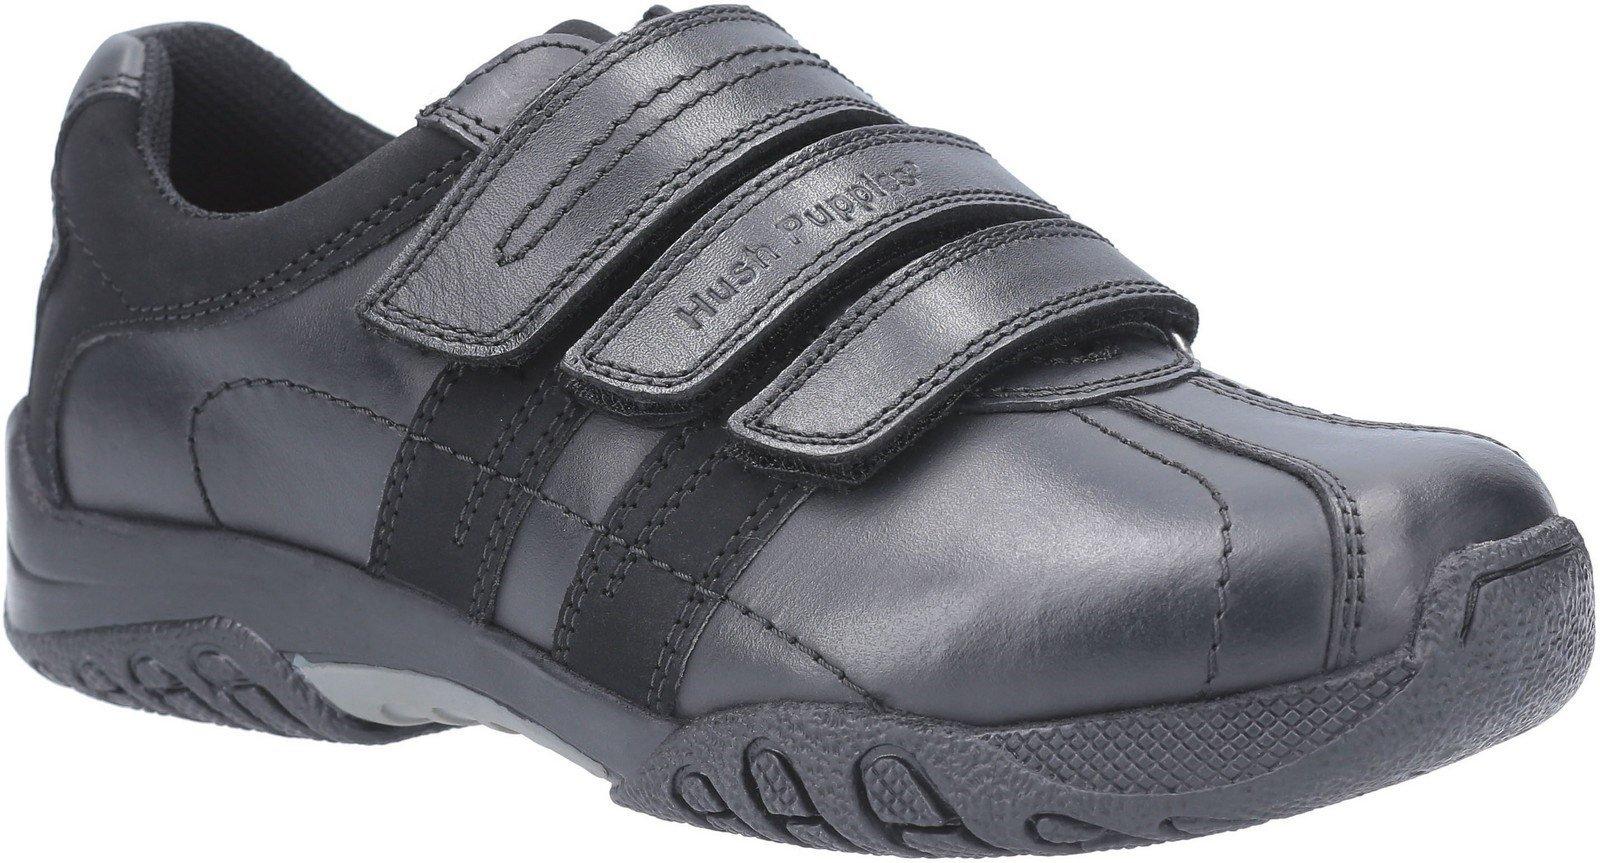 Hush Puppies Men's Seb Back To School Shoe Black 25348 - Black 10